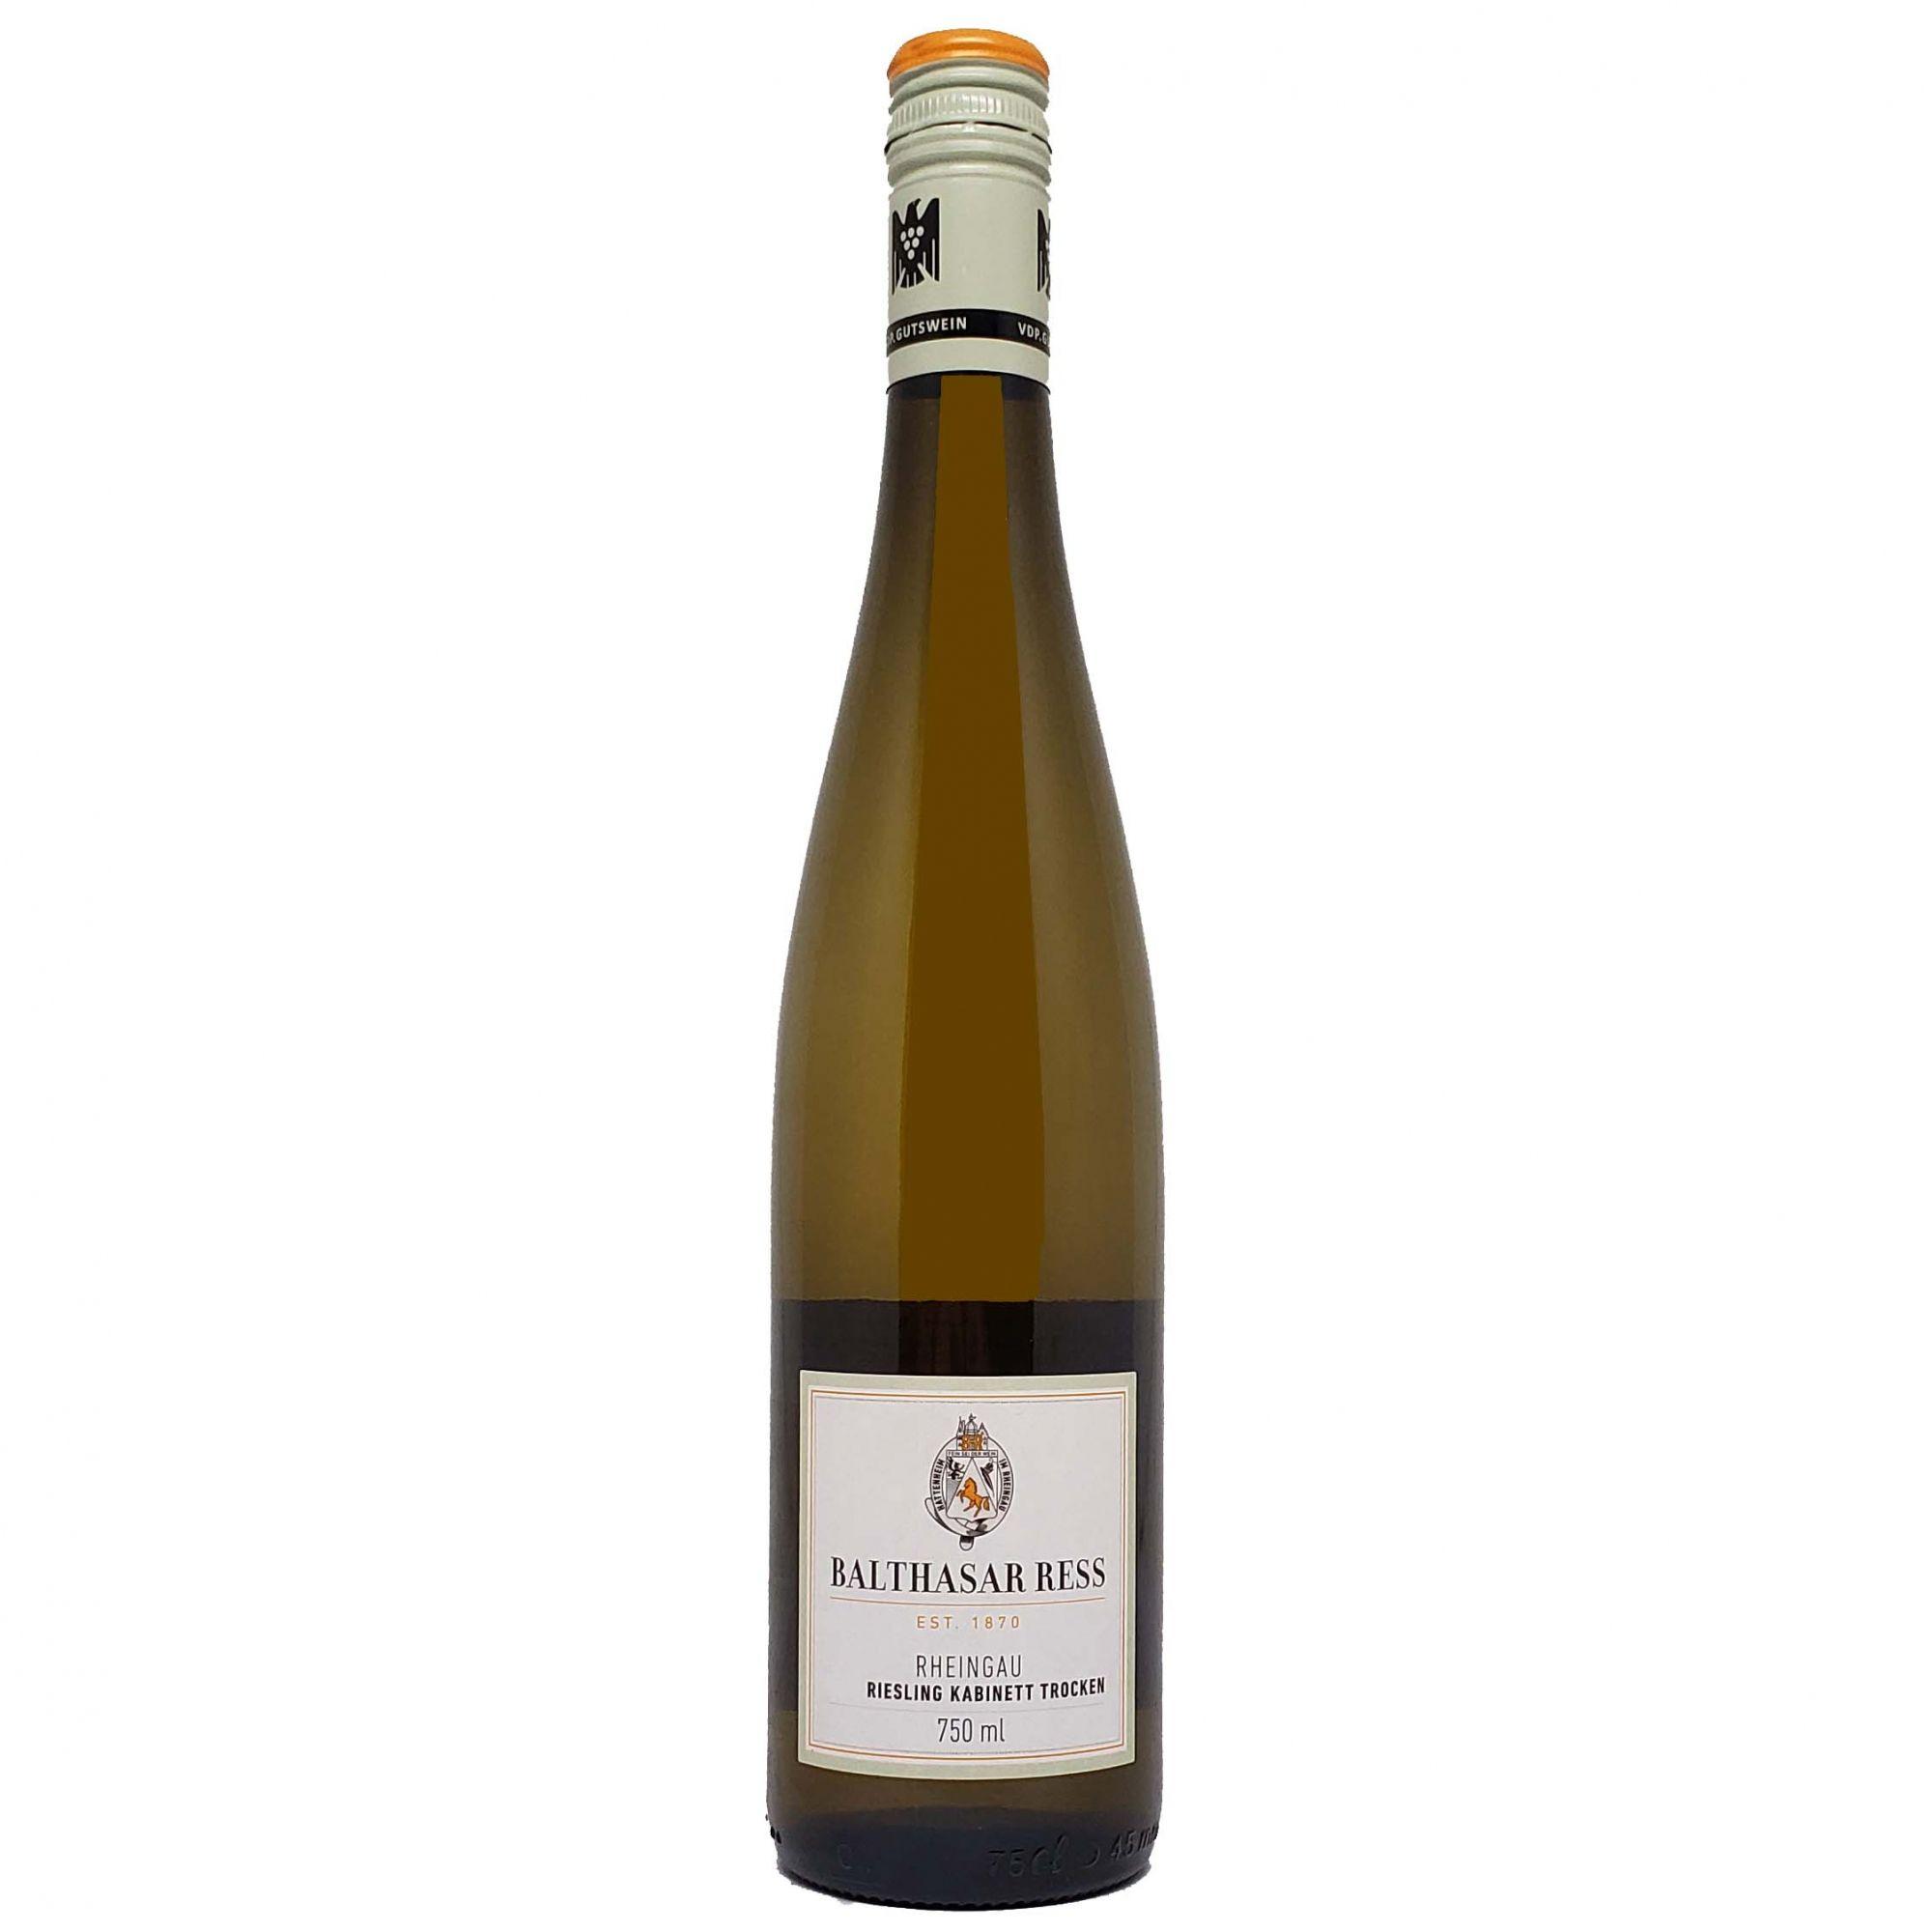 Vinho Branco Balthasar Ress Rheingau Riesling Kabinett Trocken - 750ml -